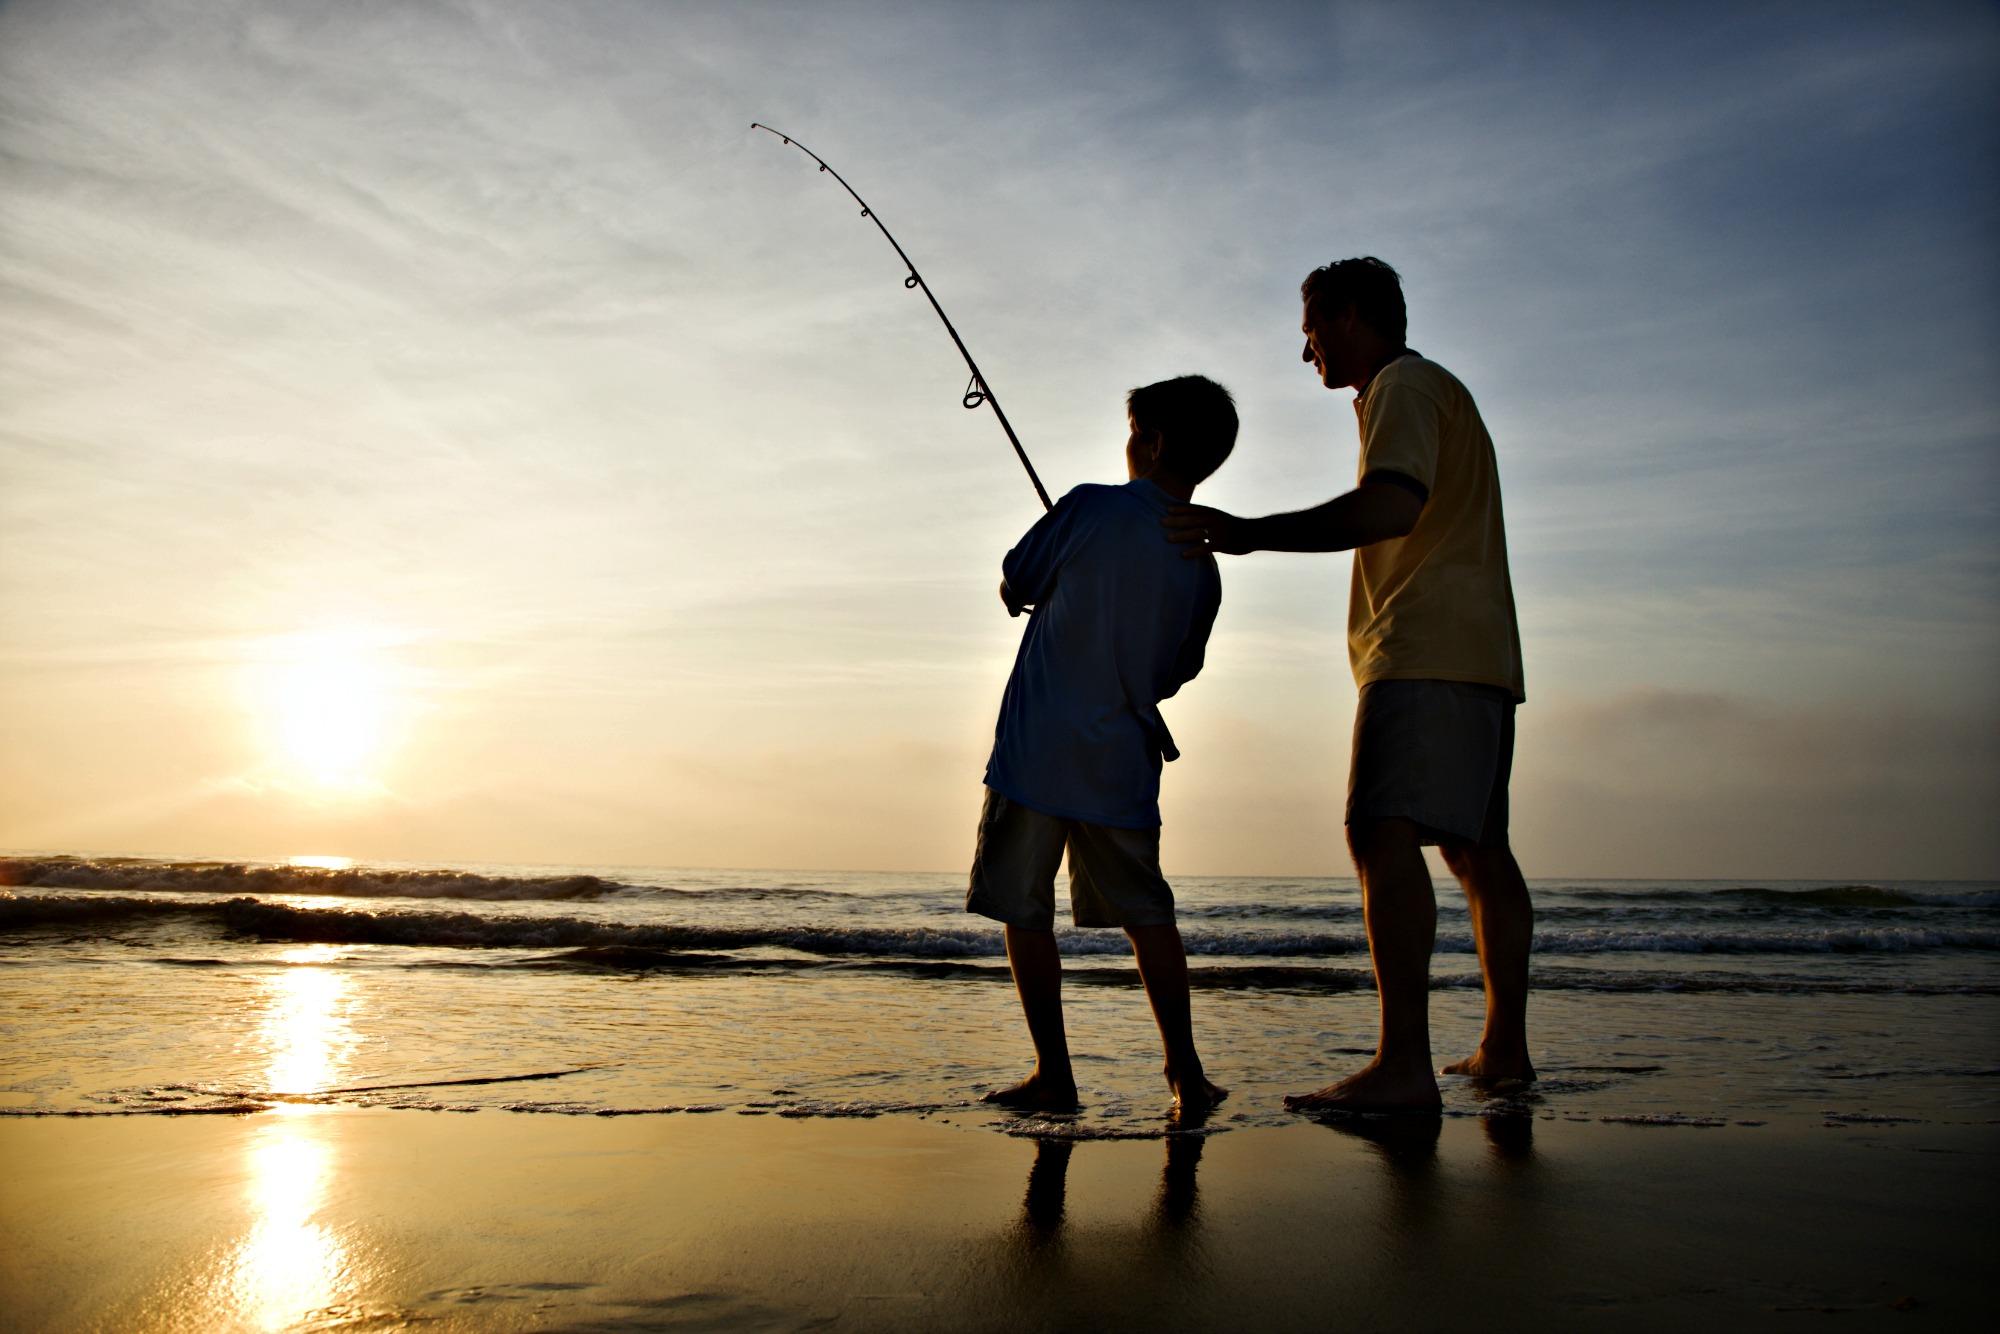 Gulf coast fishing in northwest florida and alabama a for Surf fishing destin fl